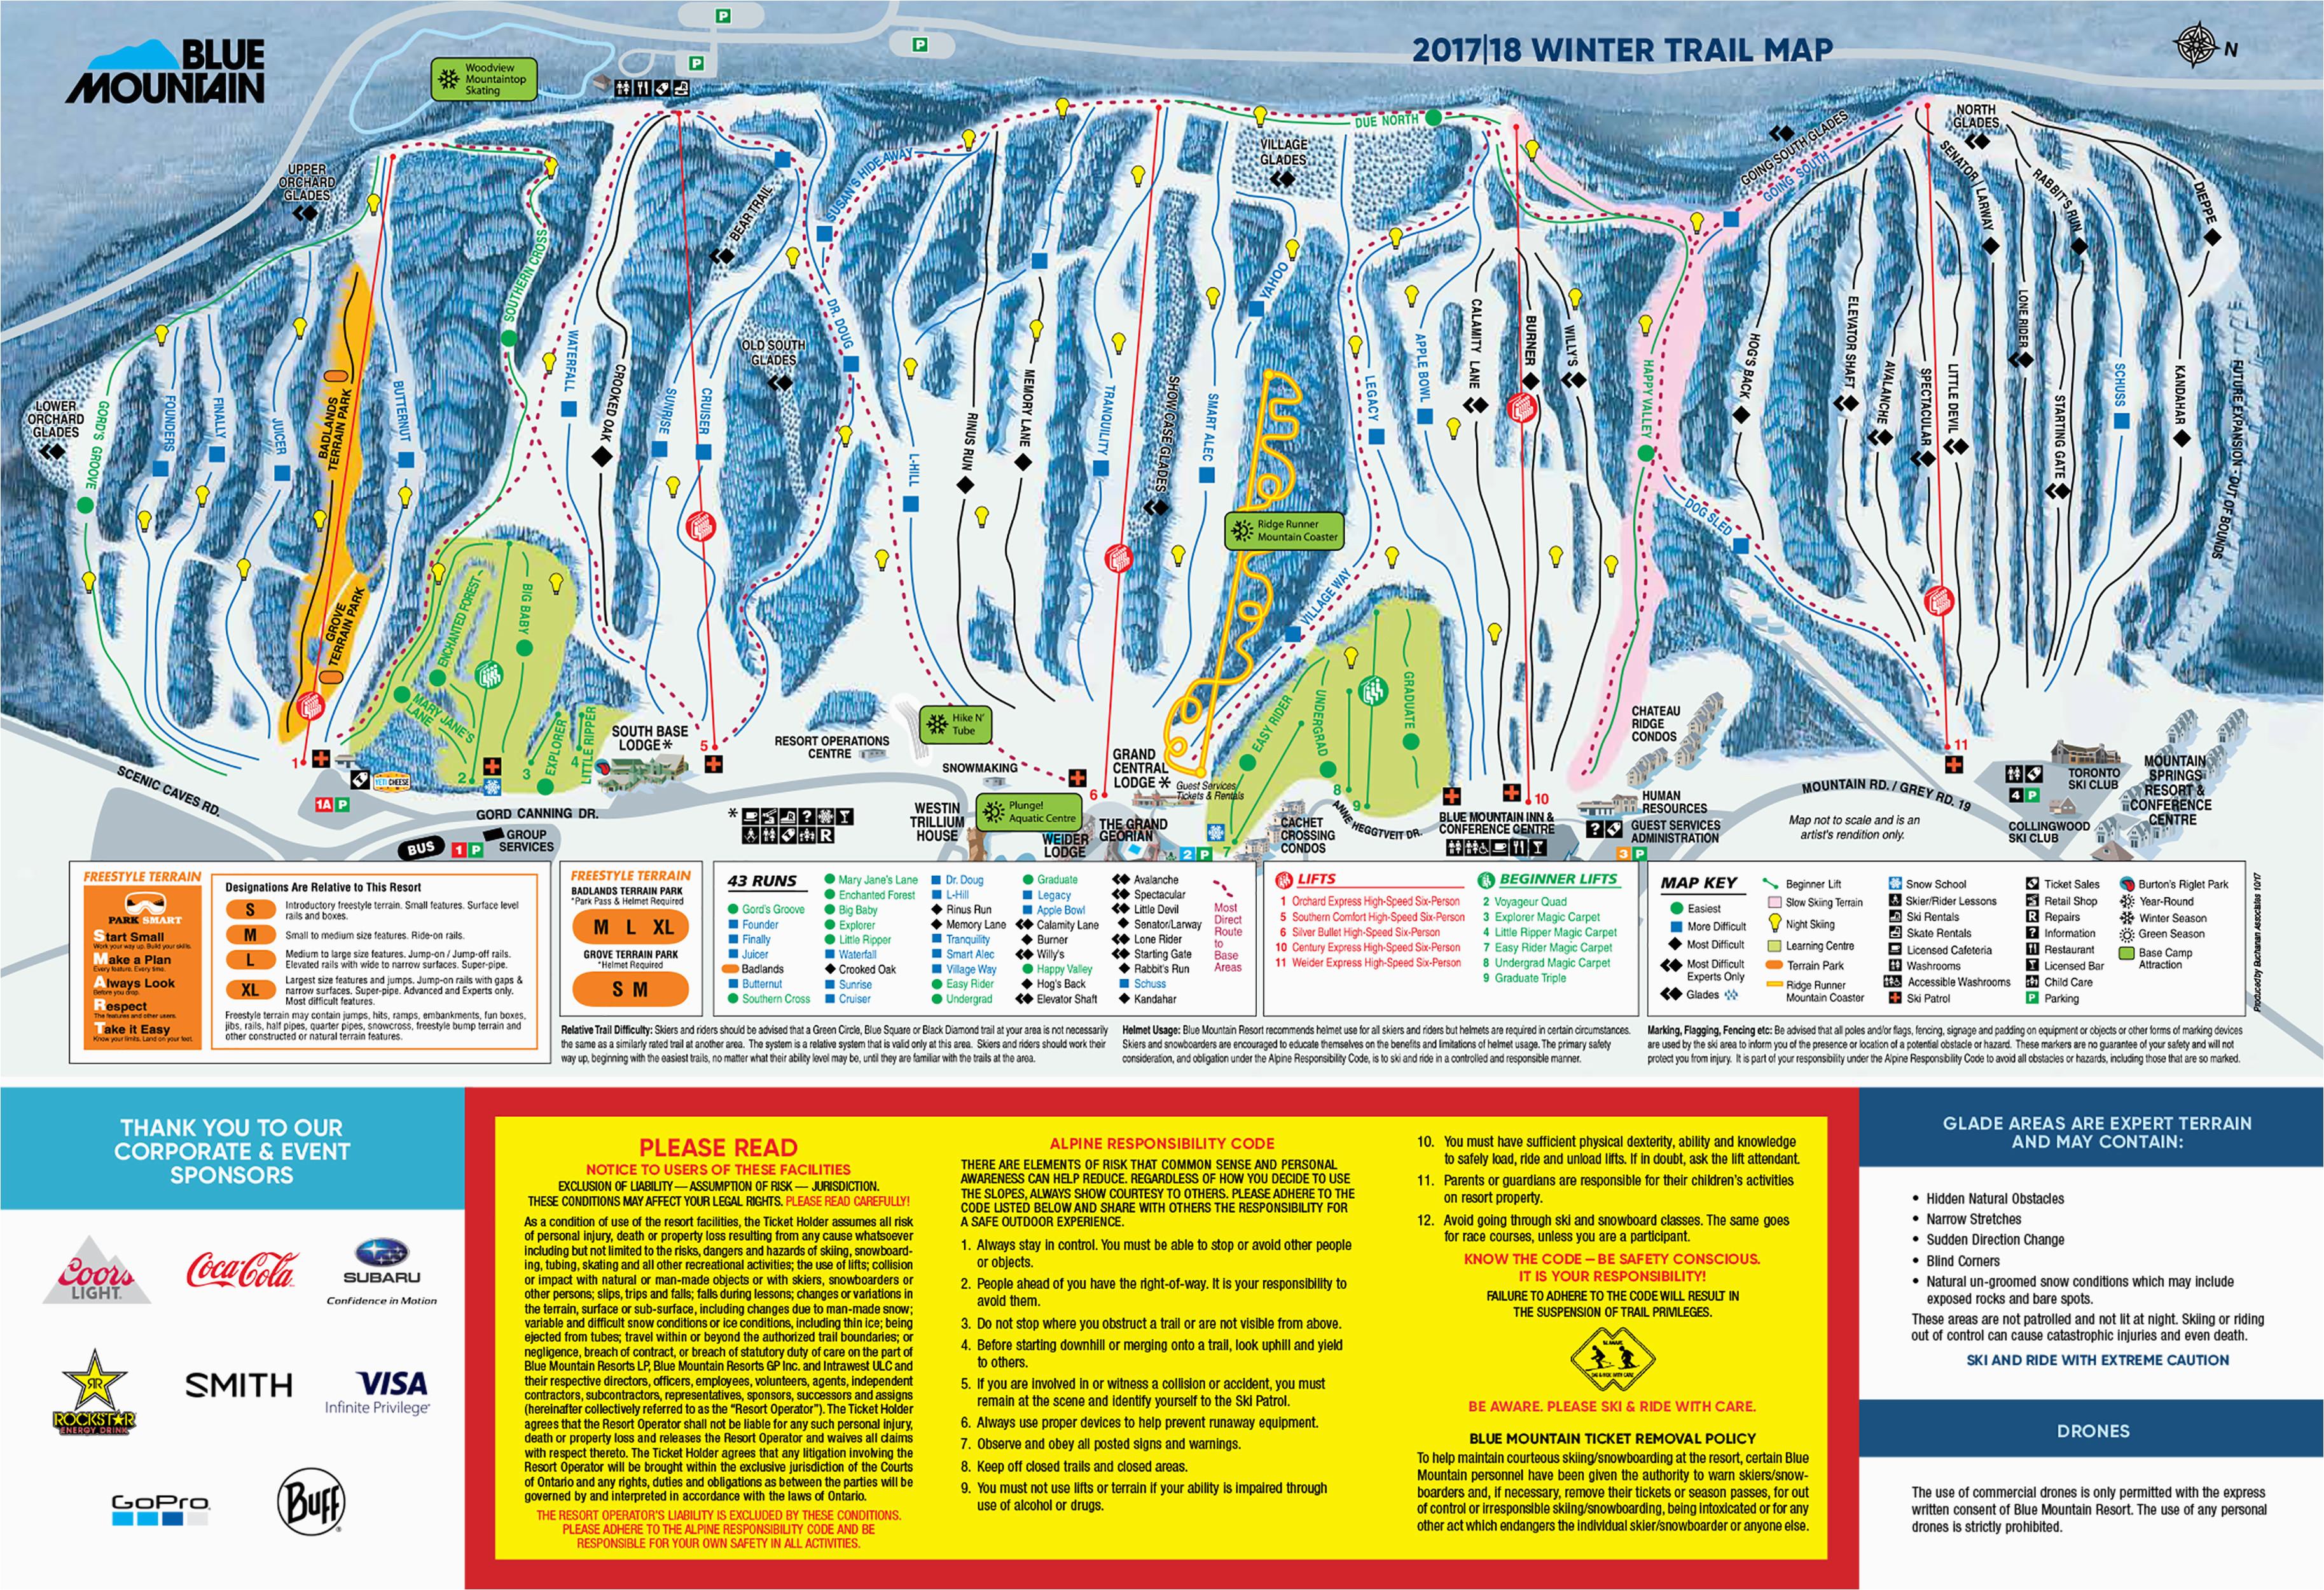 Ski Resorts Michigan Map Blue Mountain Trail Map Onthesnow